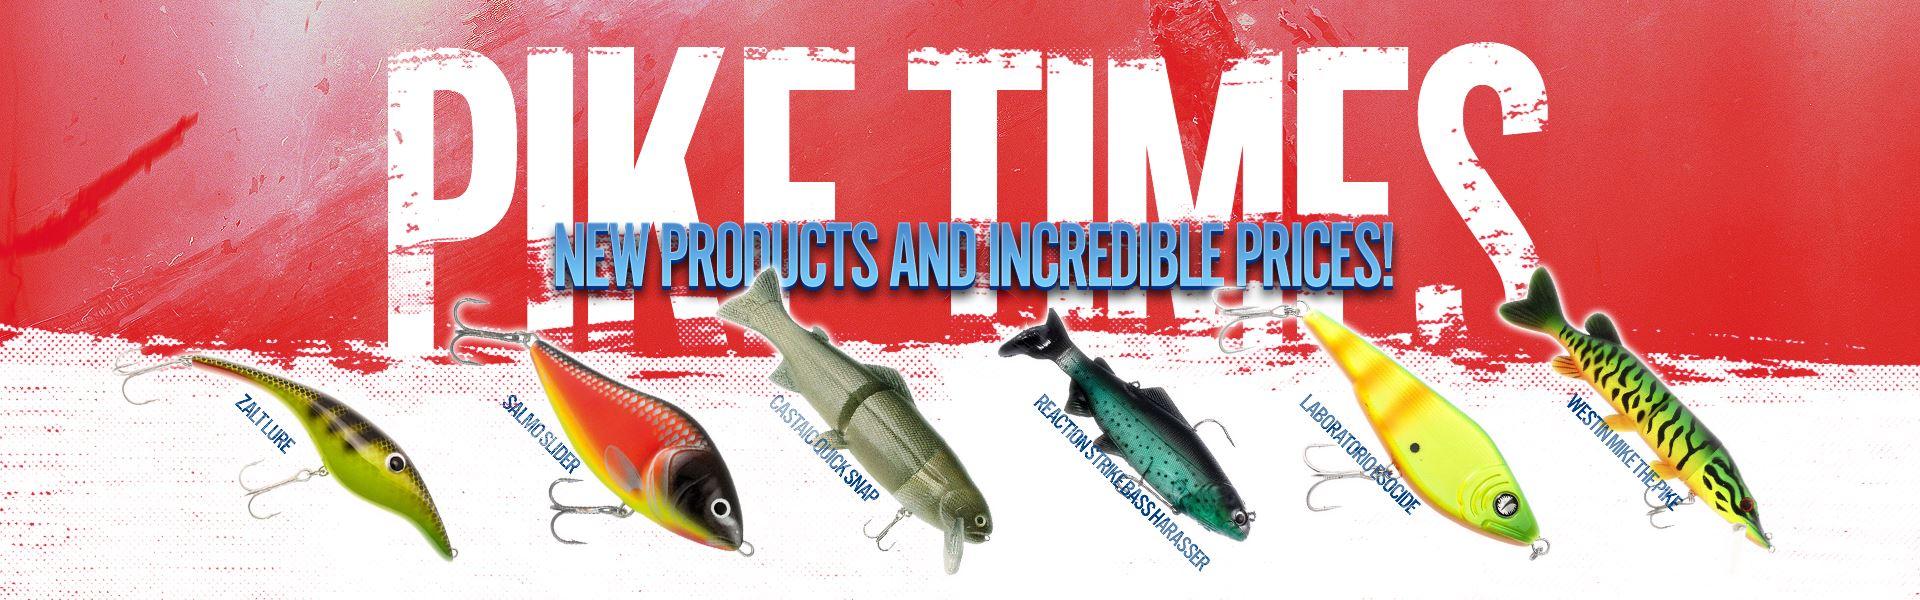 pesca al luccio, pike fishing, lurefishing, spinning, casting, bulldawg, swimbait